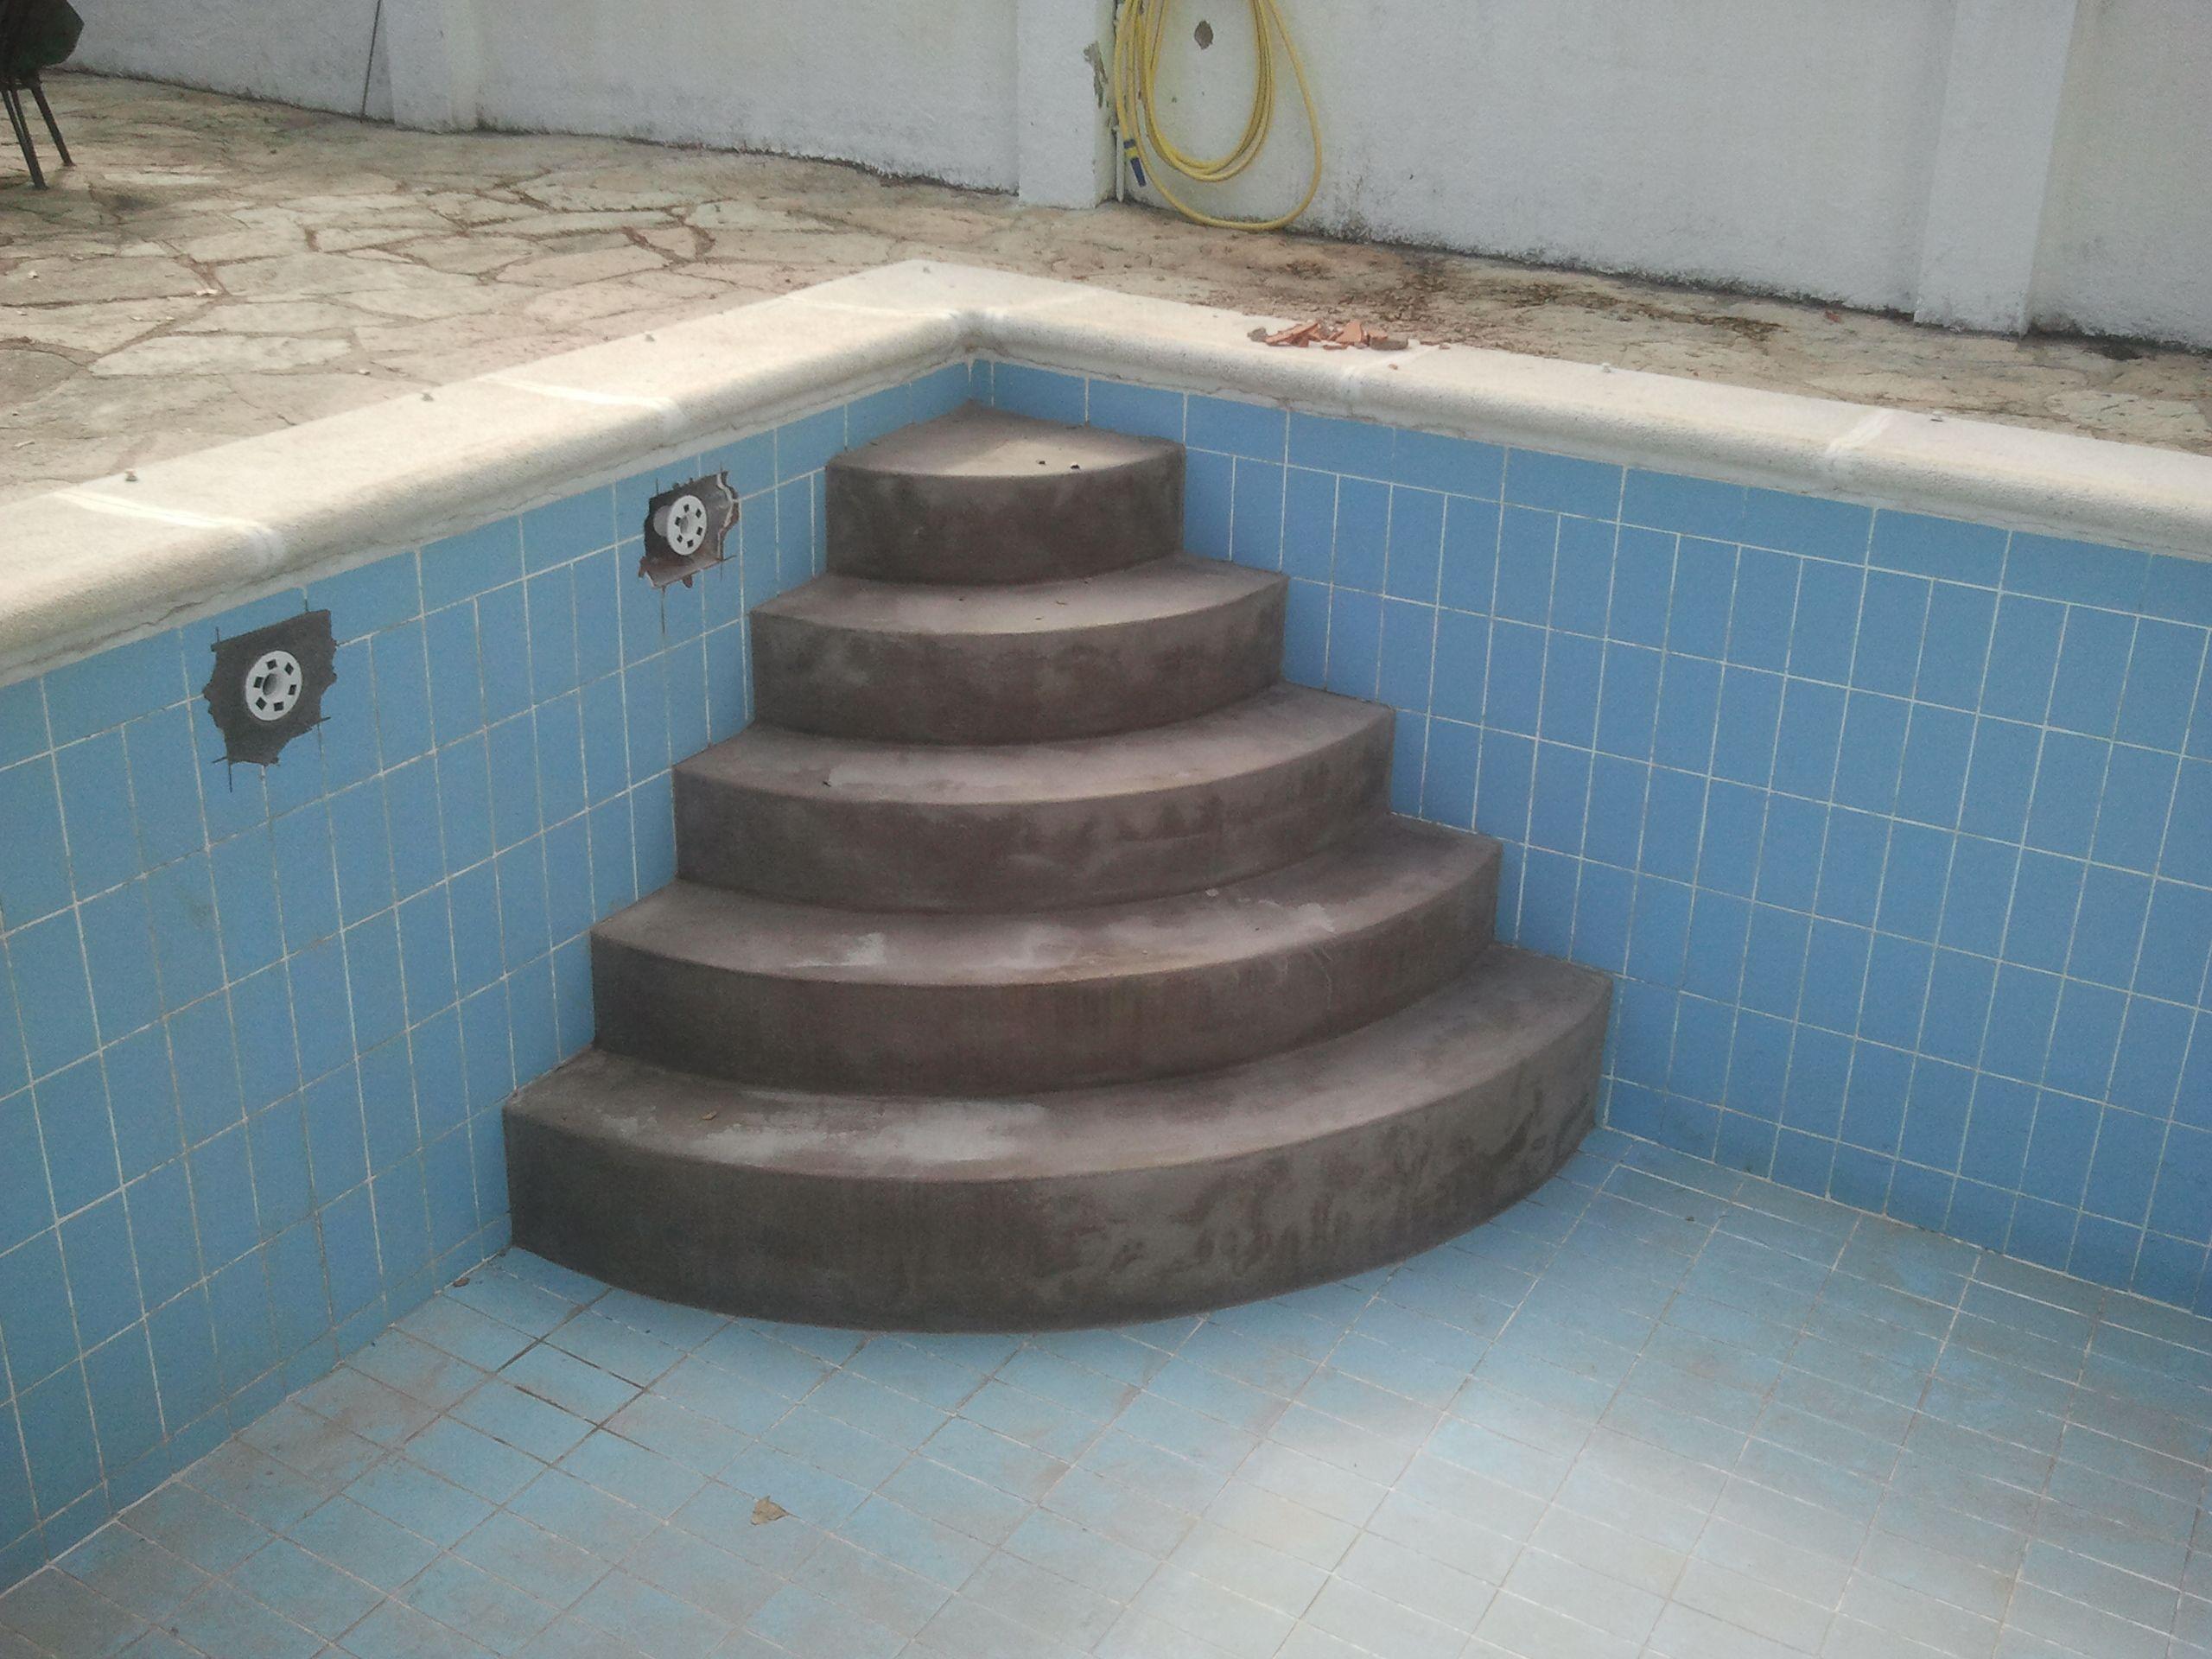 Escalera de f cil acceso de obra piscinas pinterest for Escalera piscina facil acceso